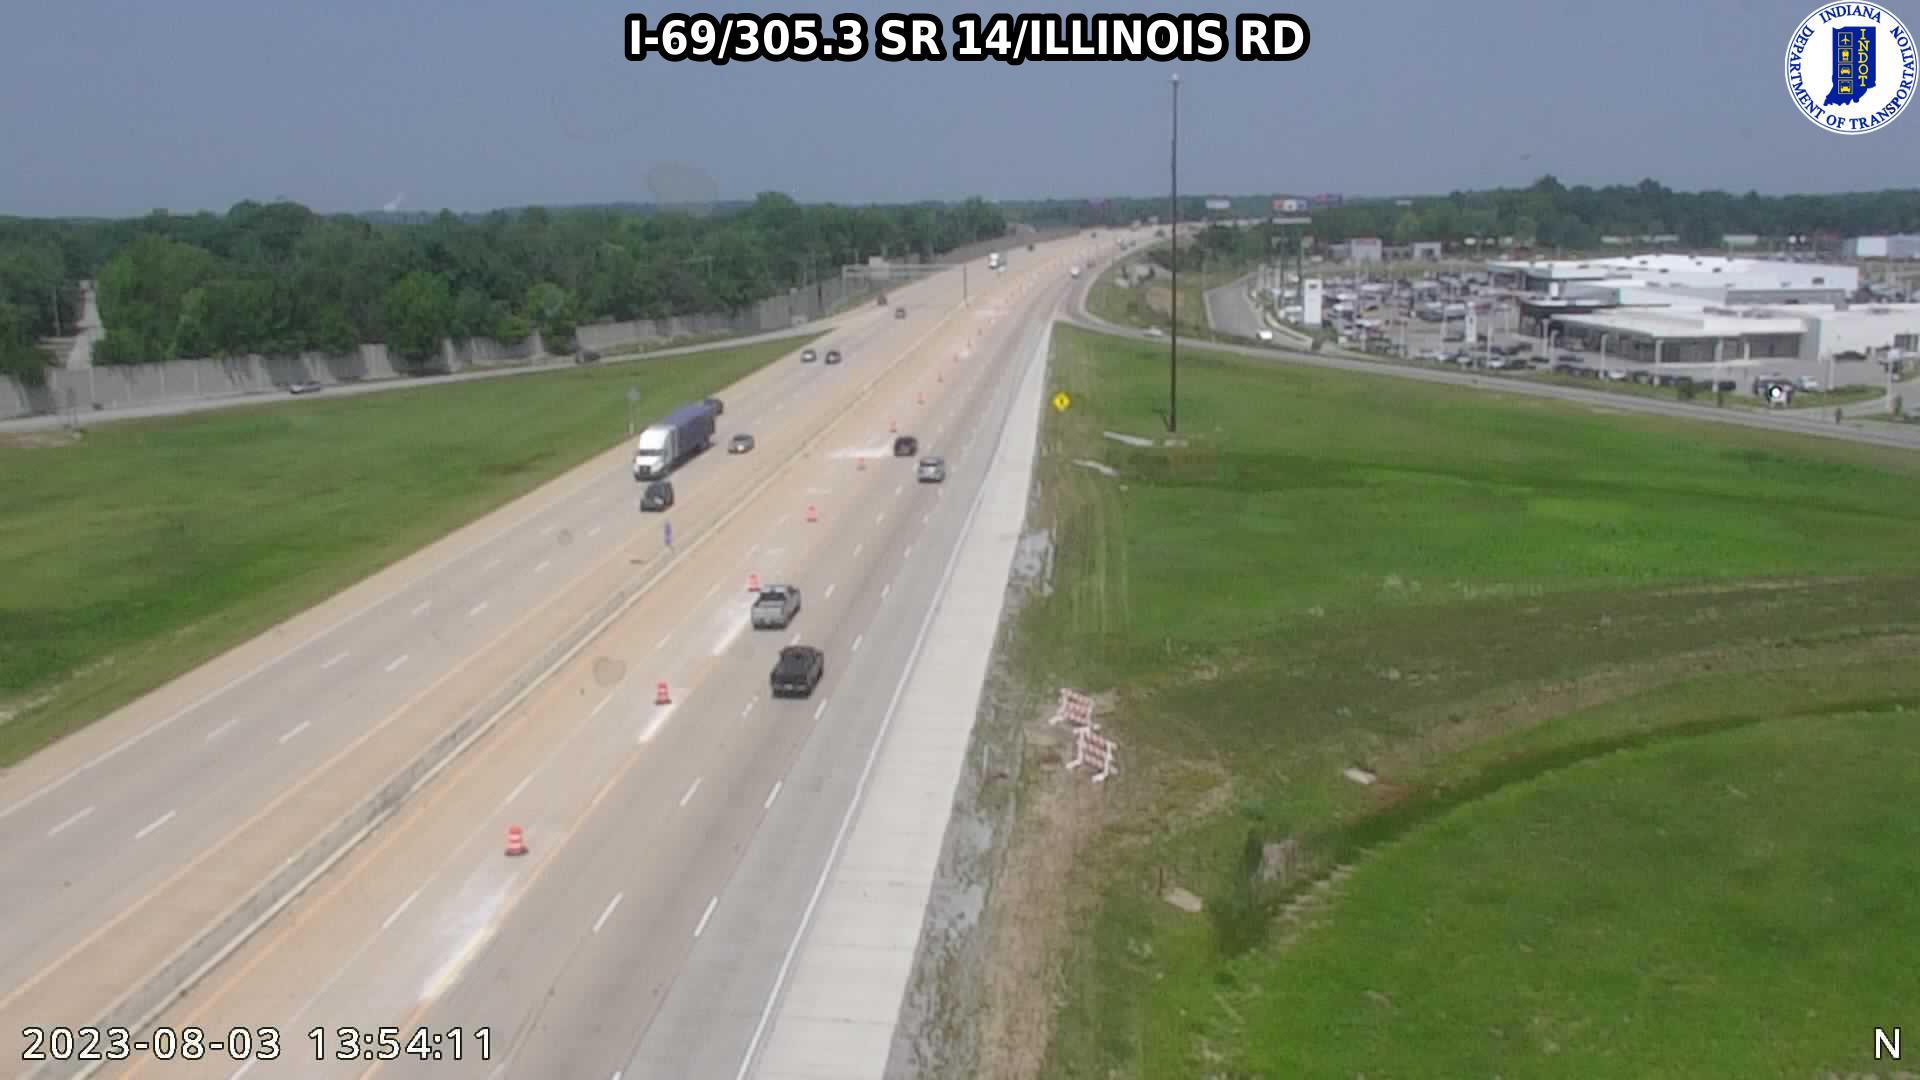 I-69 Exit 305 SR 14/ILLINOIS RD CAM